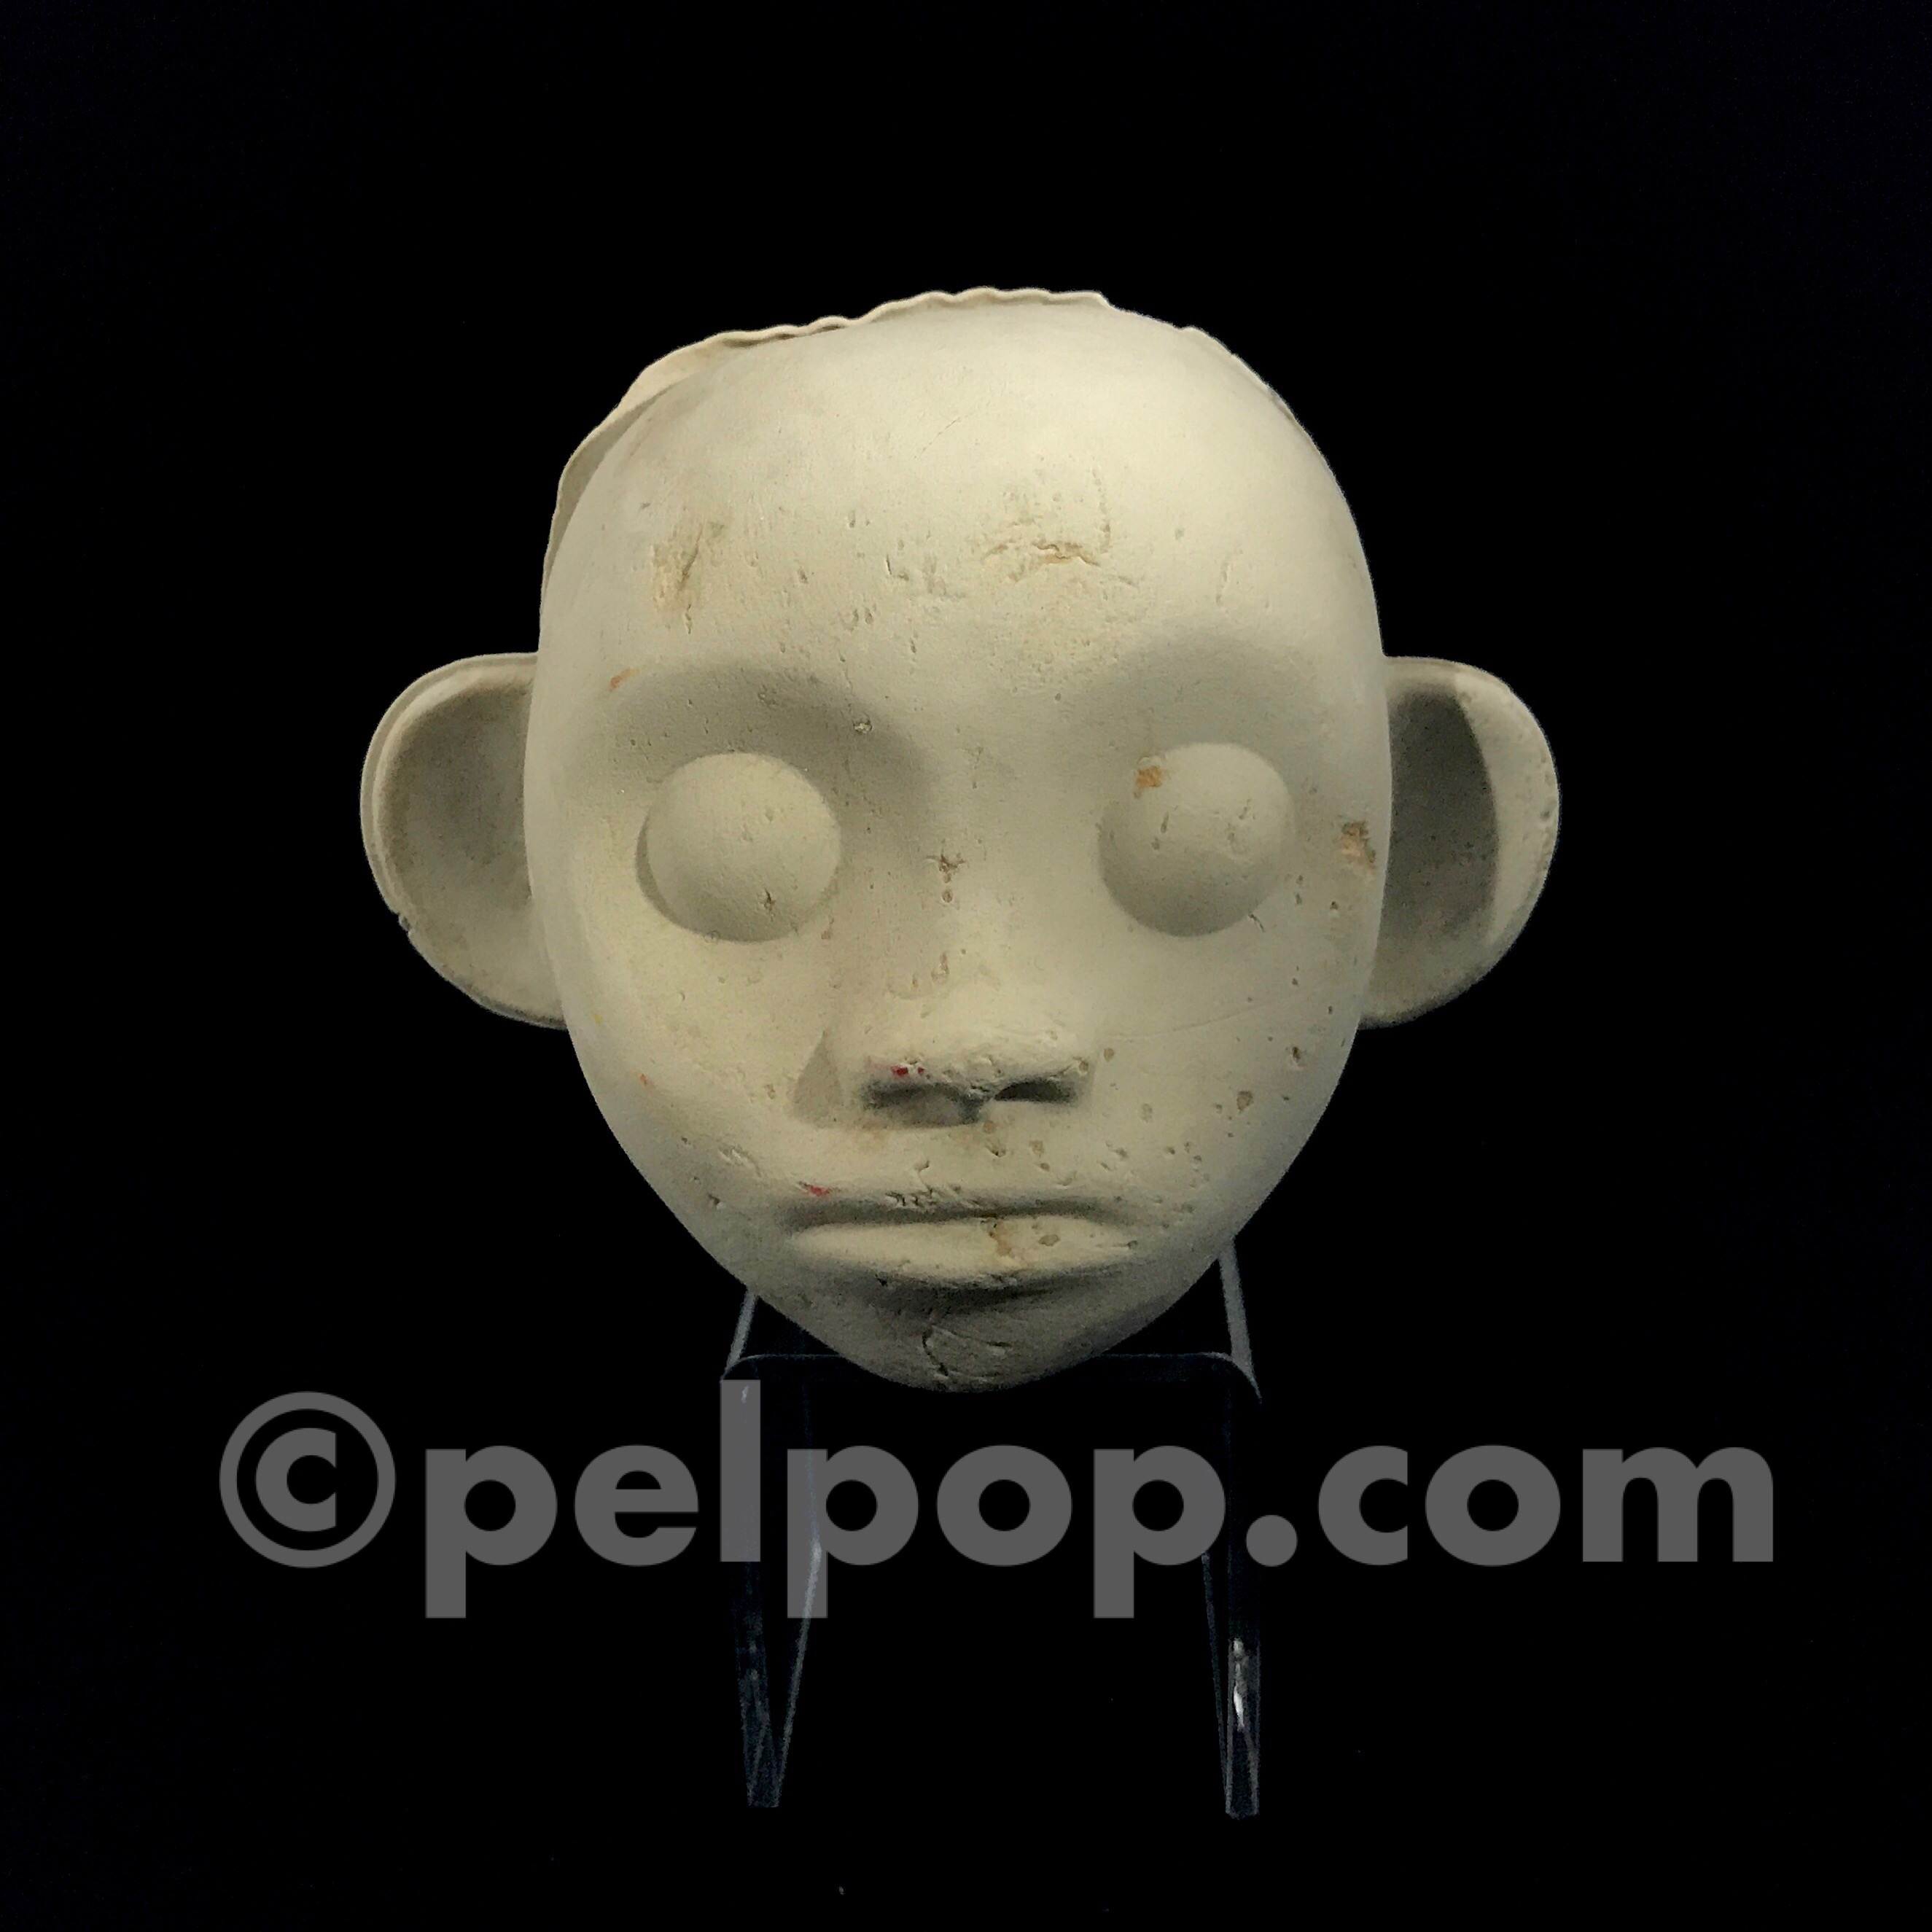 Mexican Boy (Pepe)